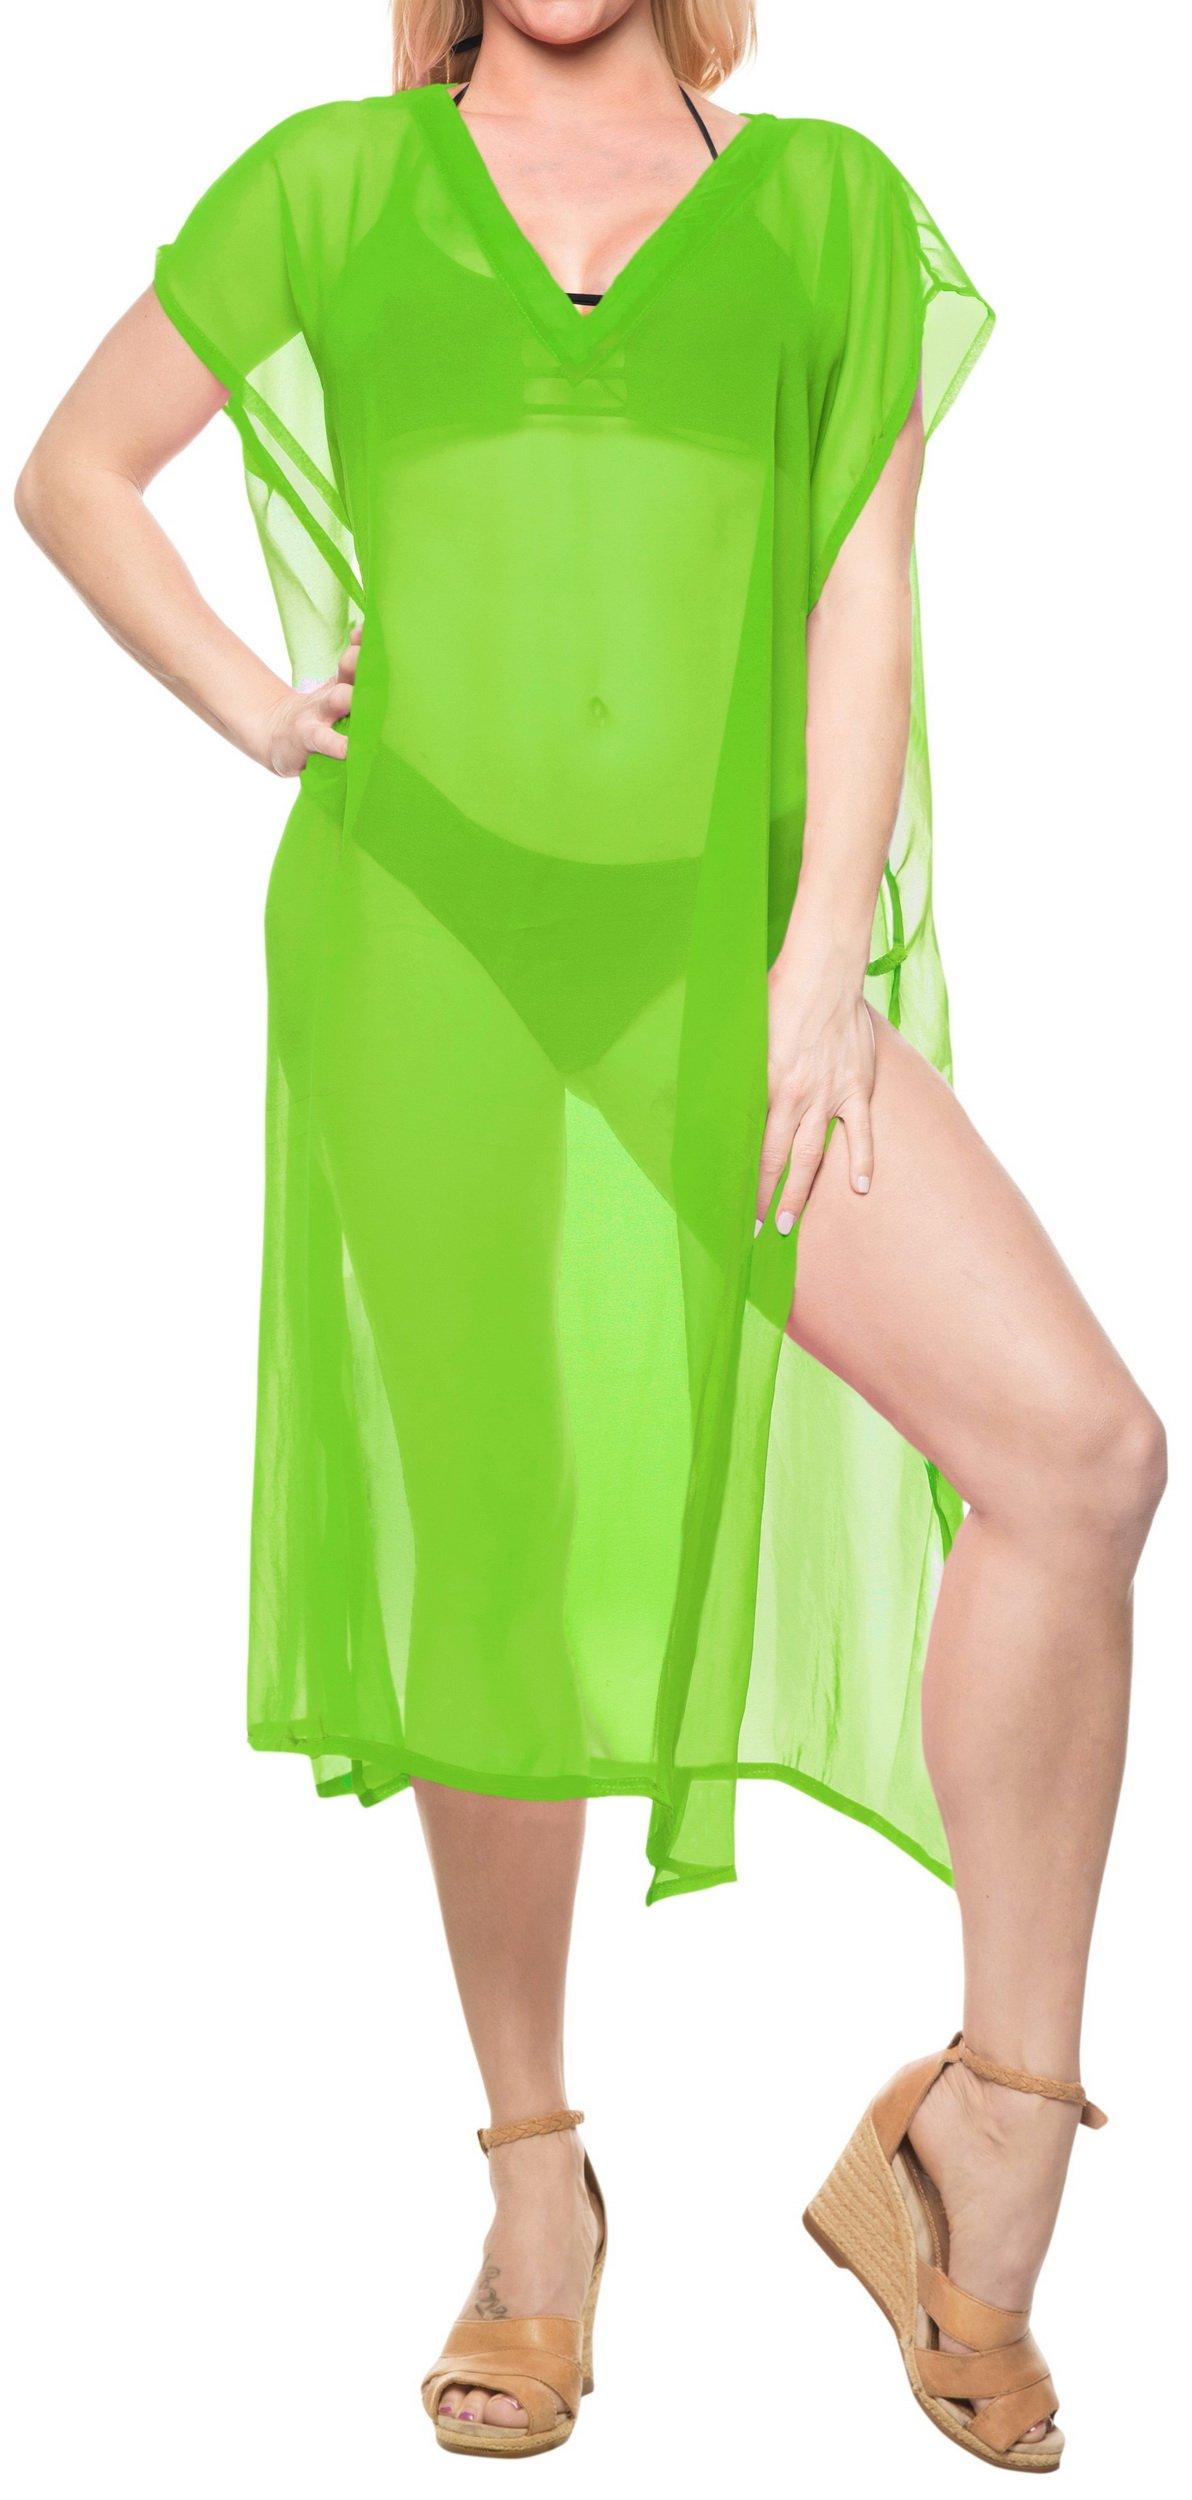 LA LEELA Women's Swimsuit Bikini Stylish Beach Cover Up Kaftan Solid Plain A